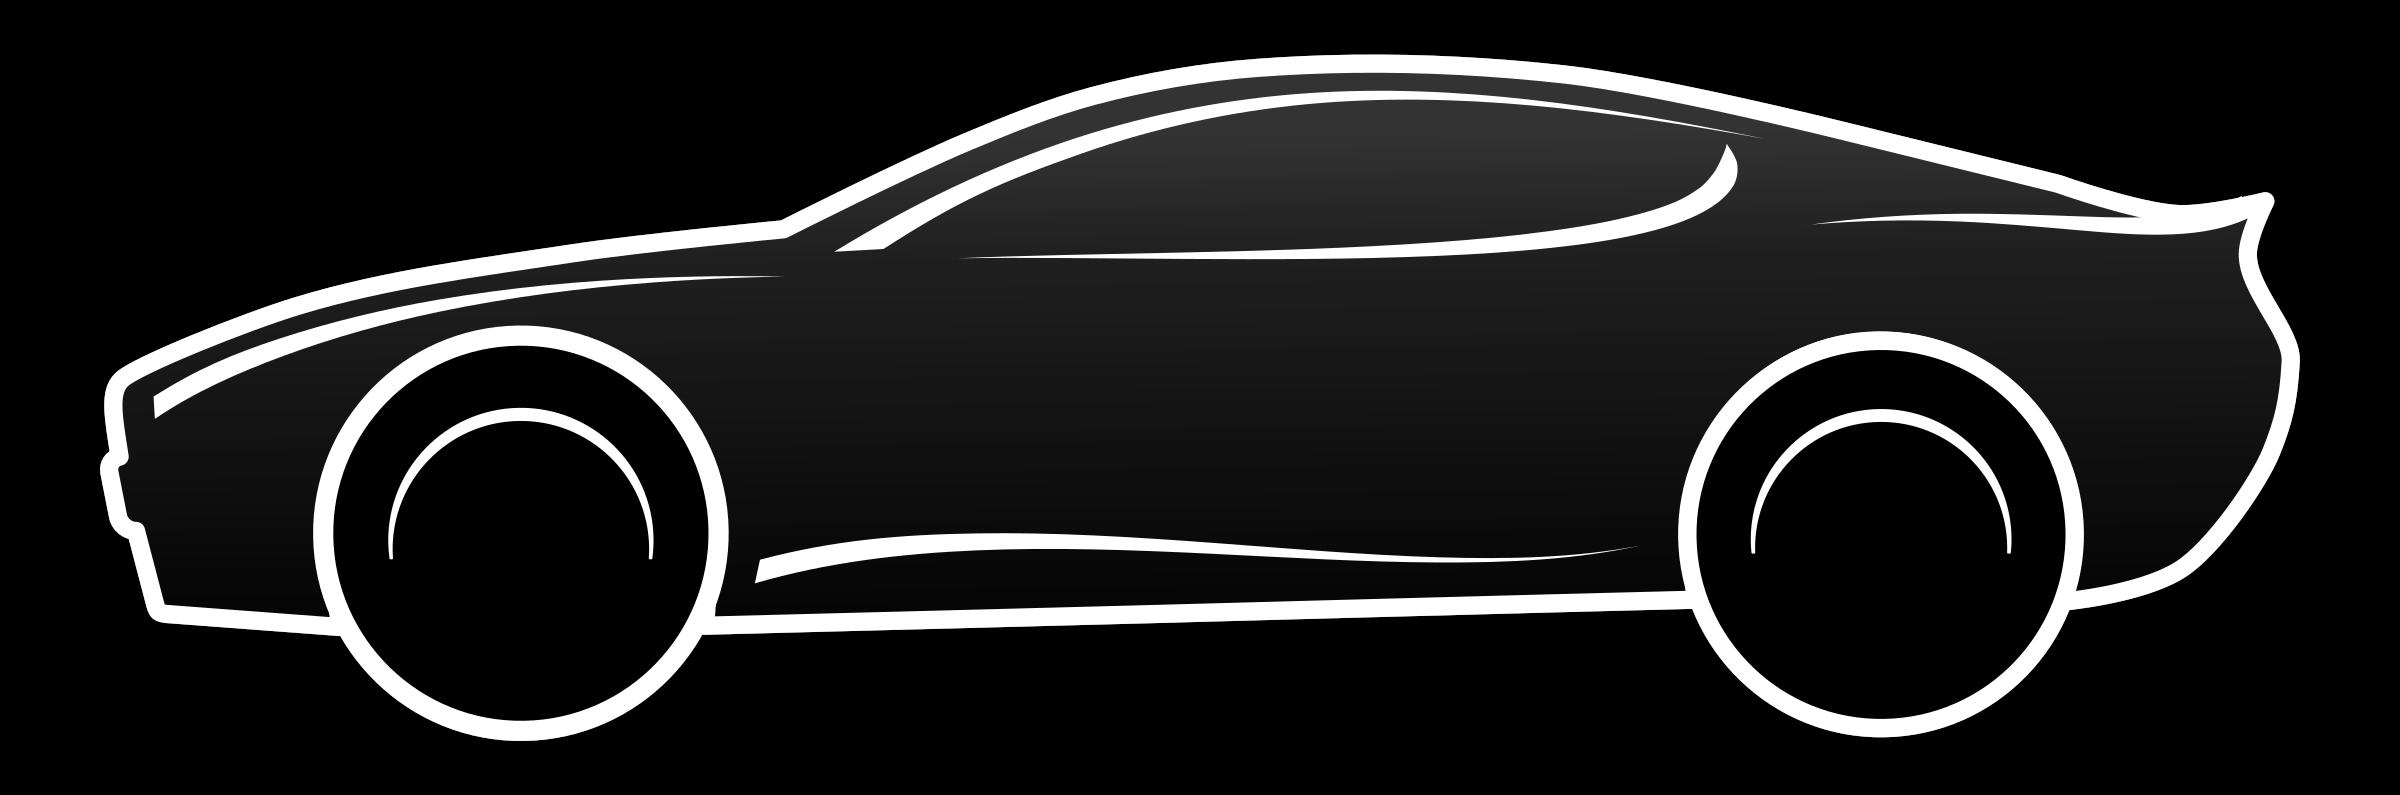 Car black free black and white car clip art file.